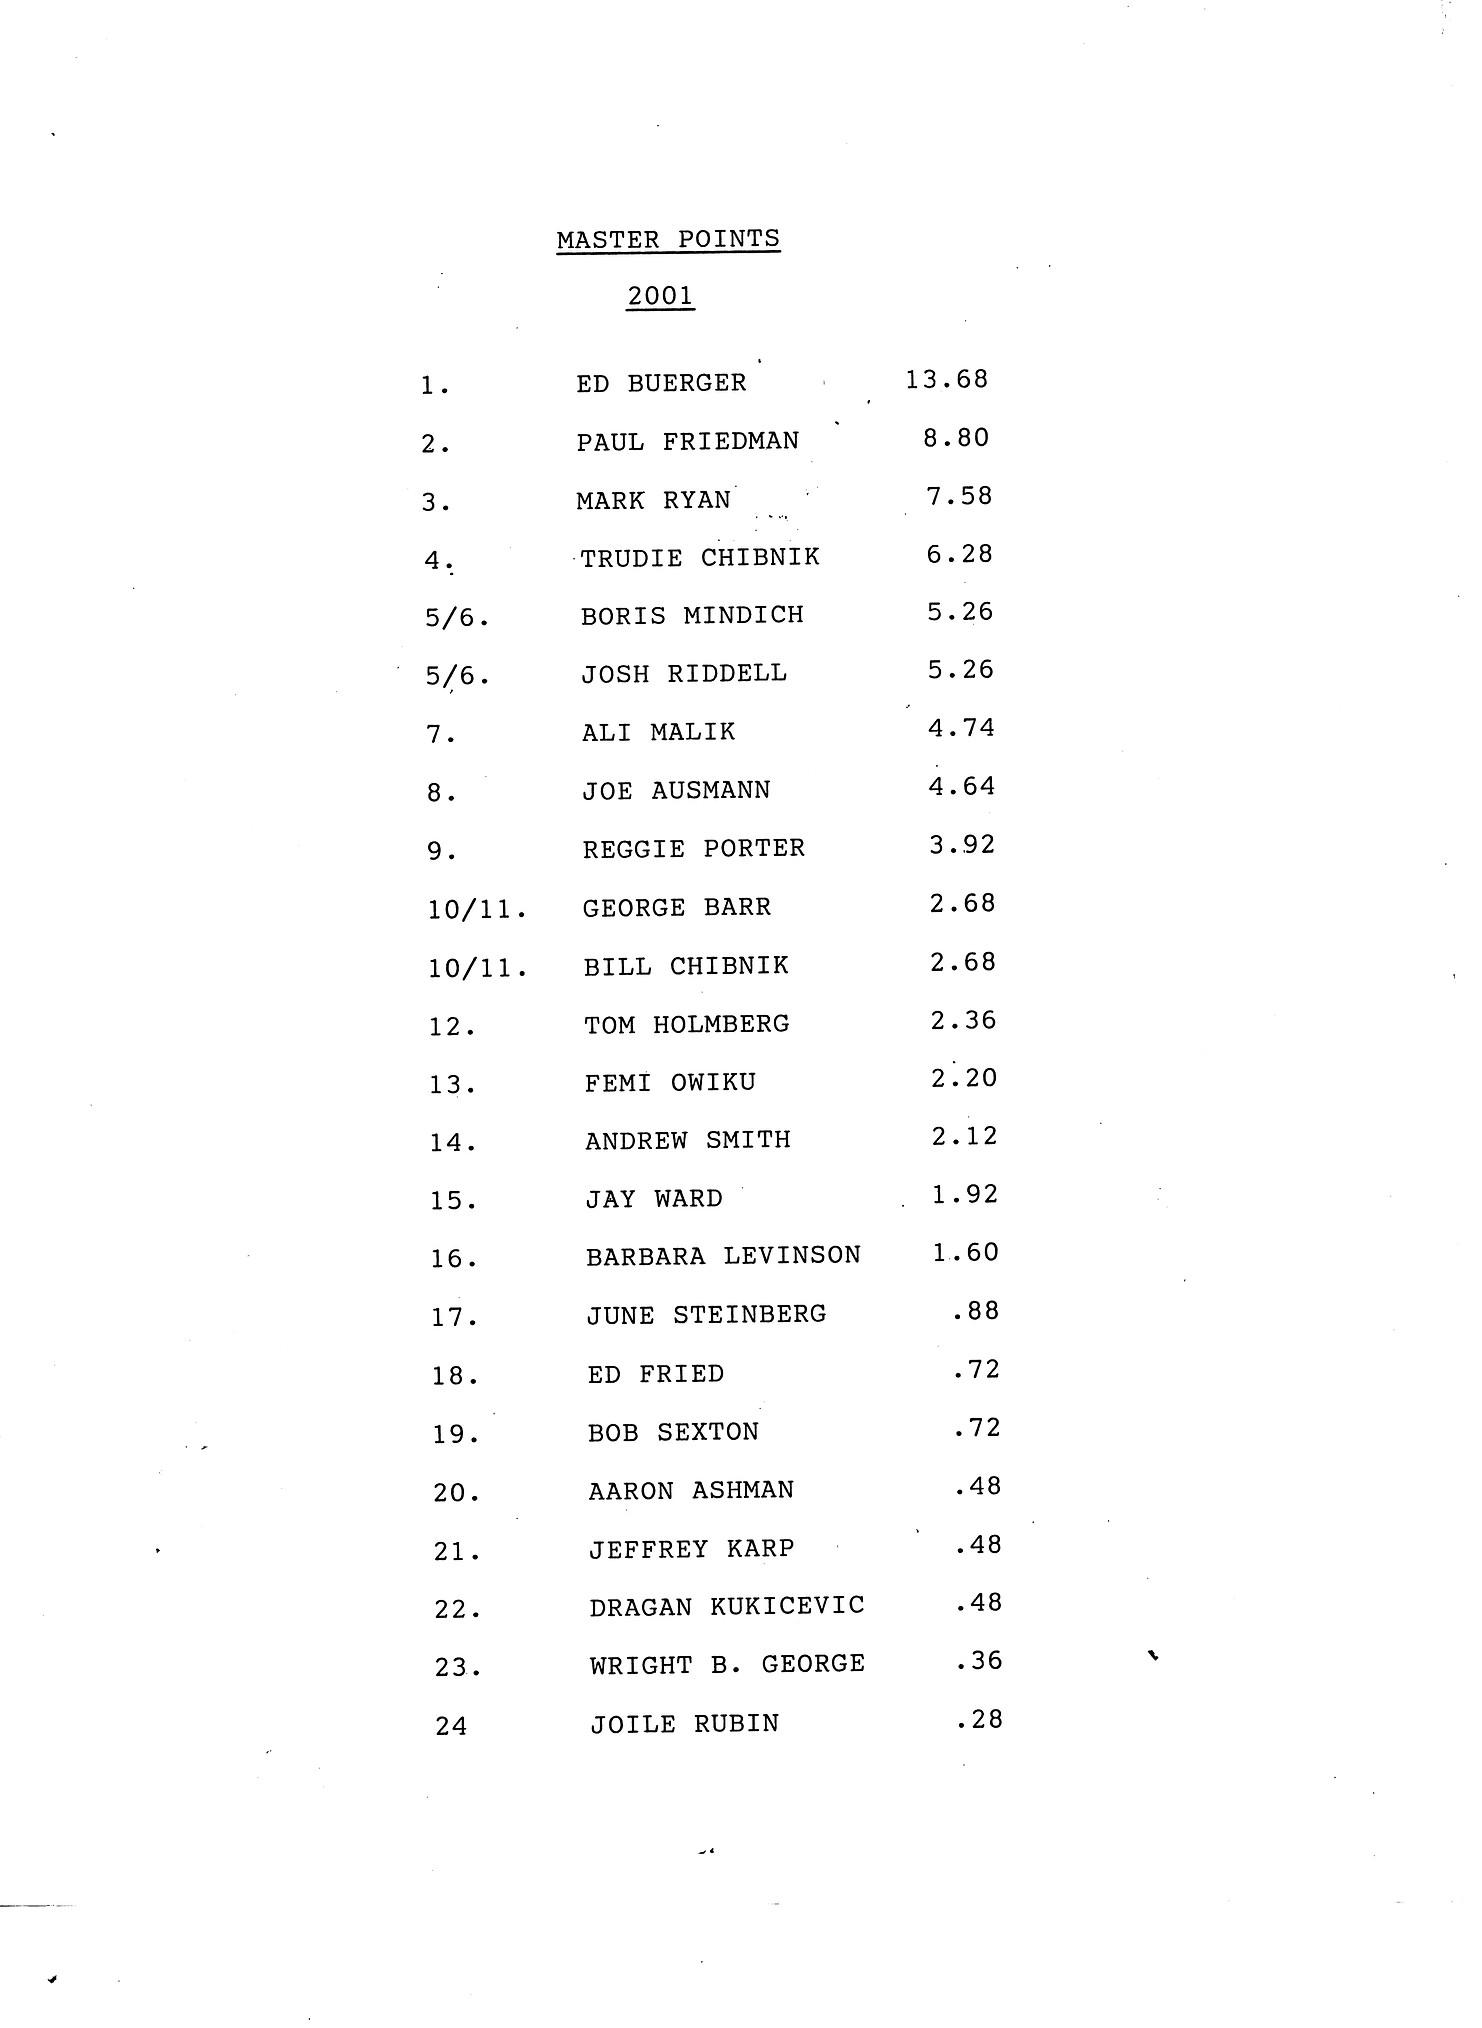 2001 - WBC Standings.jpeg